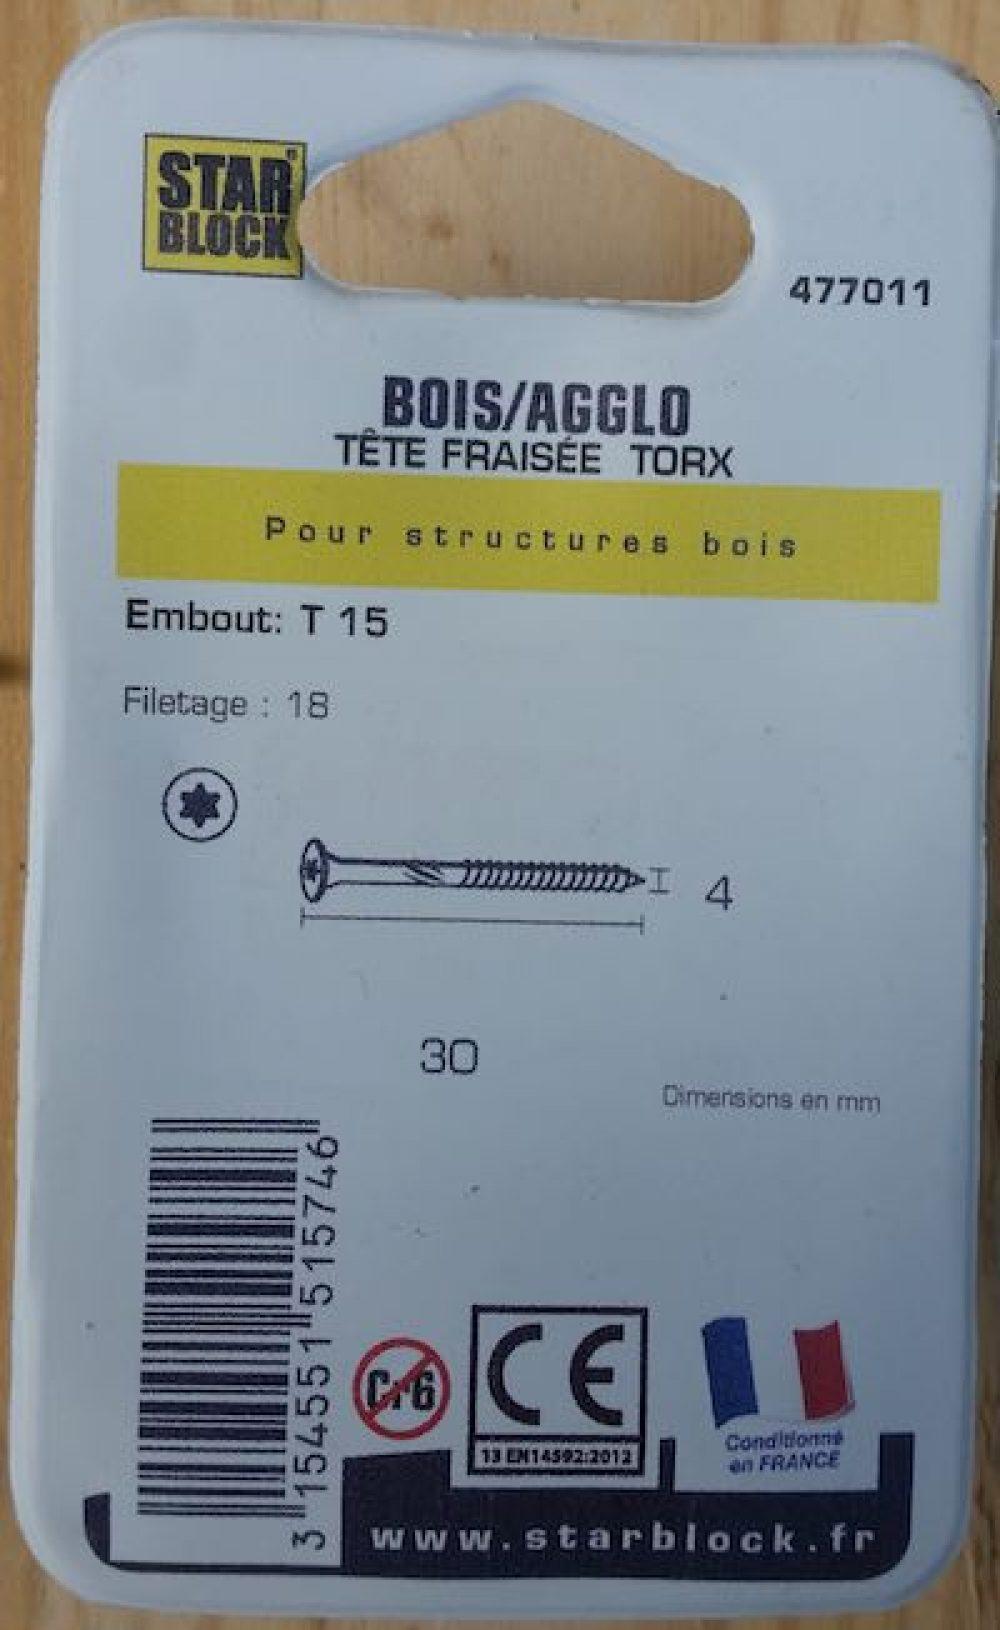 Boite 100 vis starblock 4x30 mm acier zingue fraisee torx verso